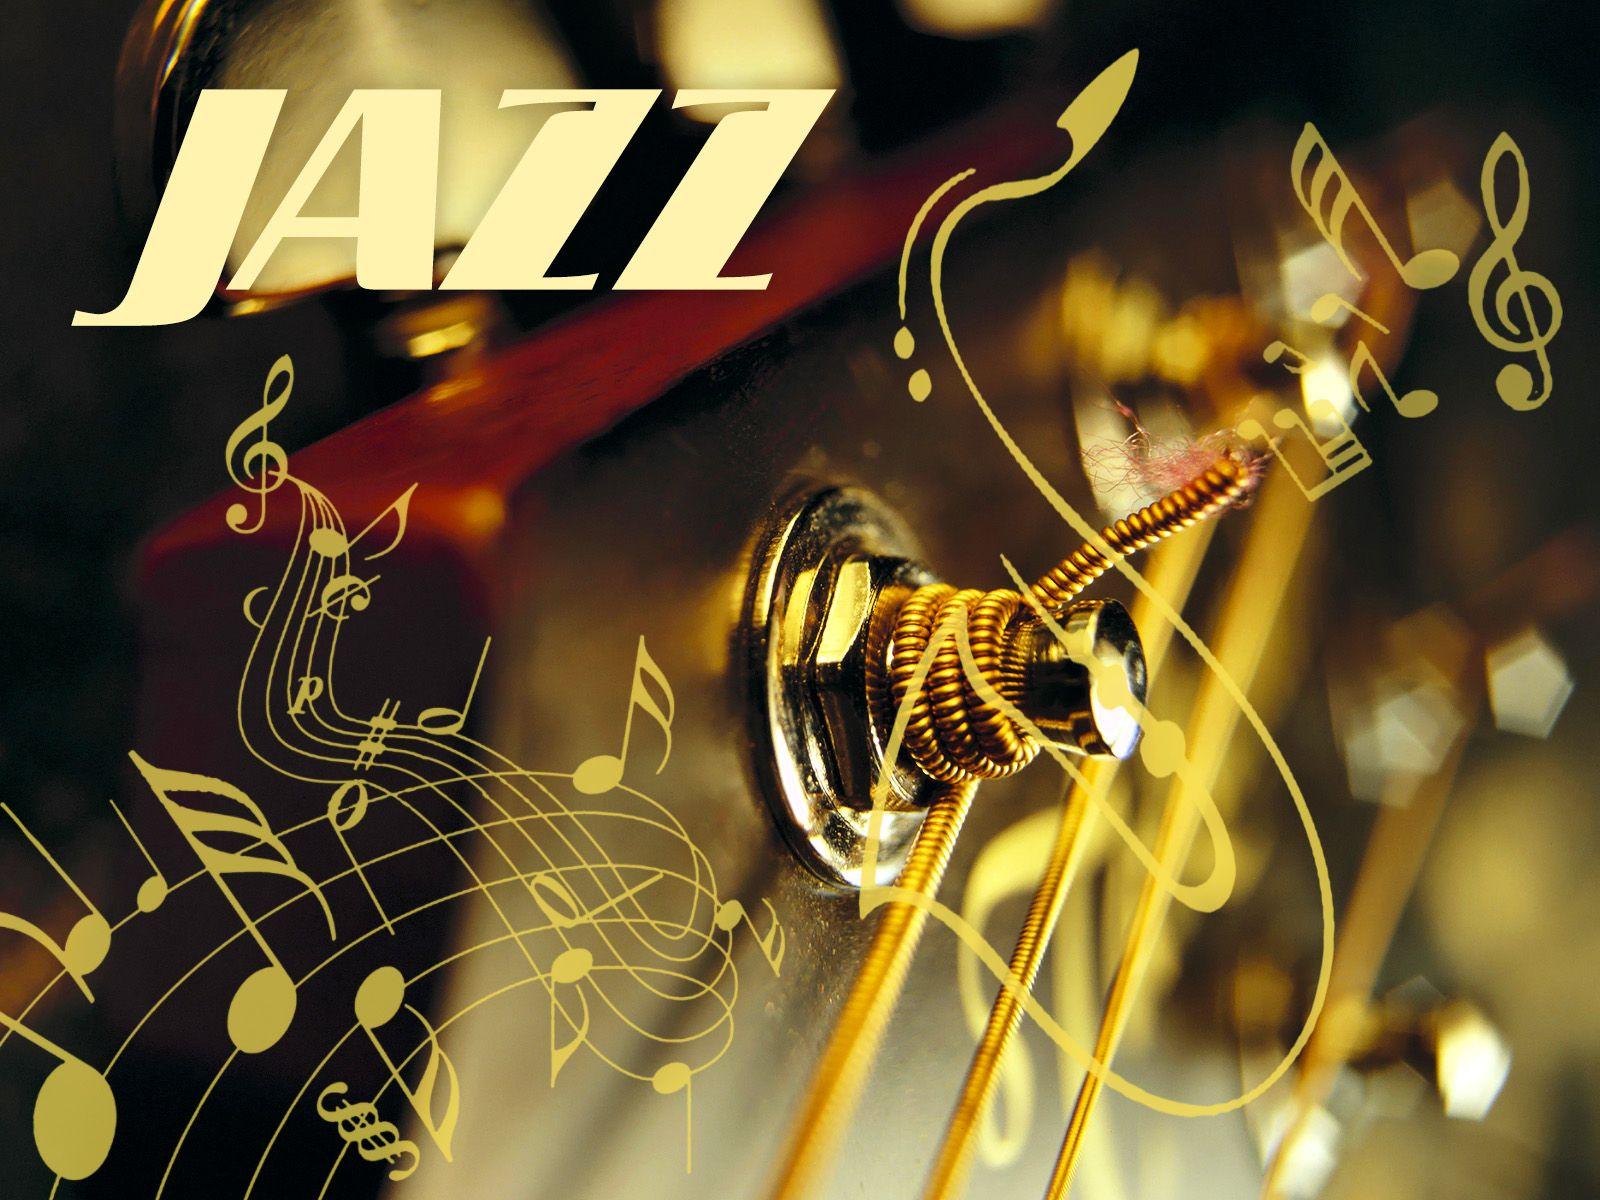 Jazz Wallpaper Wallpaper Jazz Wallpaper Hd Wallpaper Background Music Wallpaper Classic Jazz Hd Wallpaper